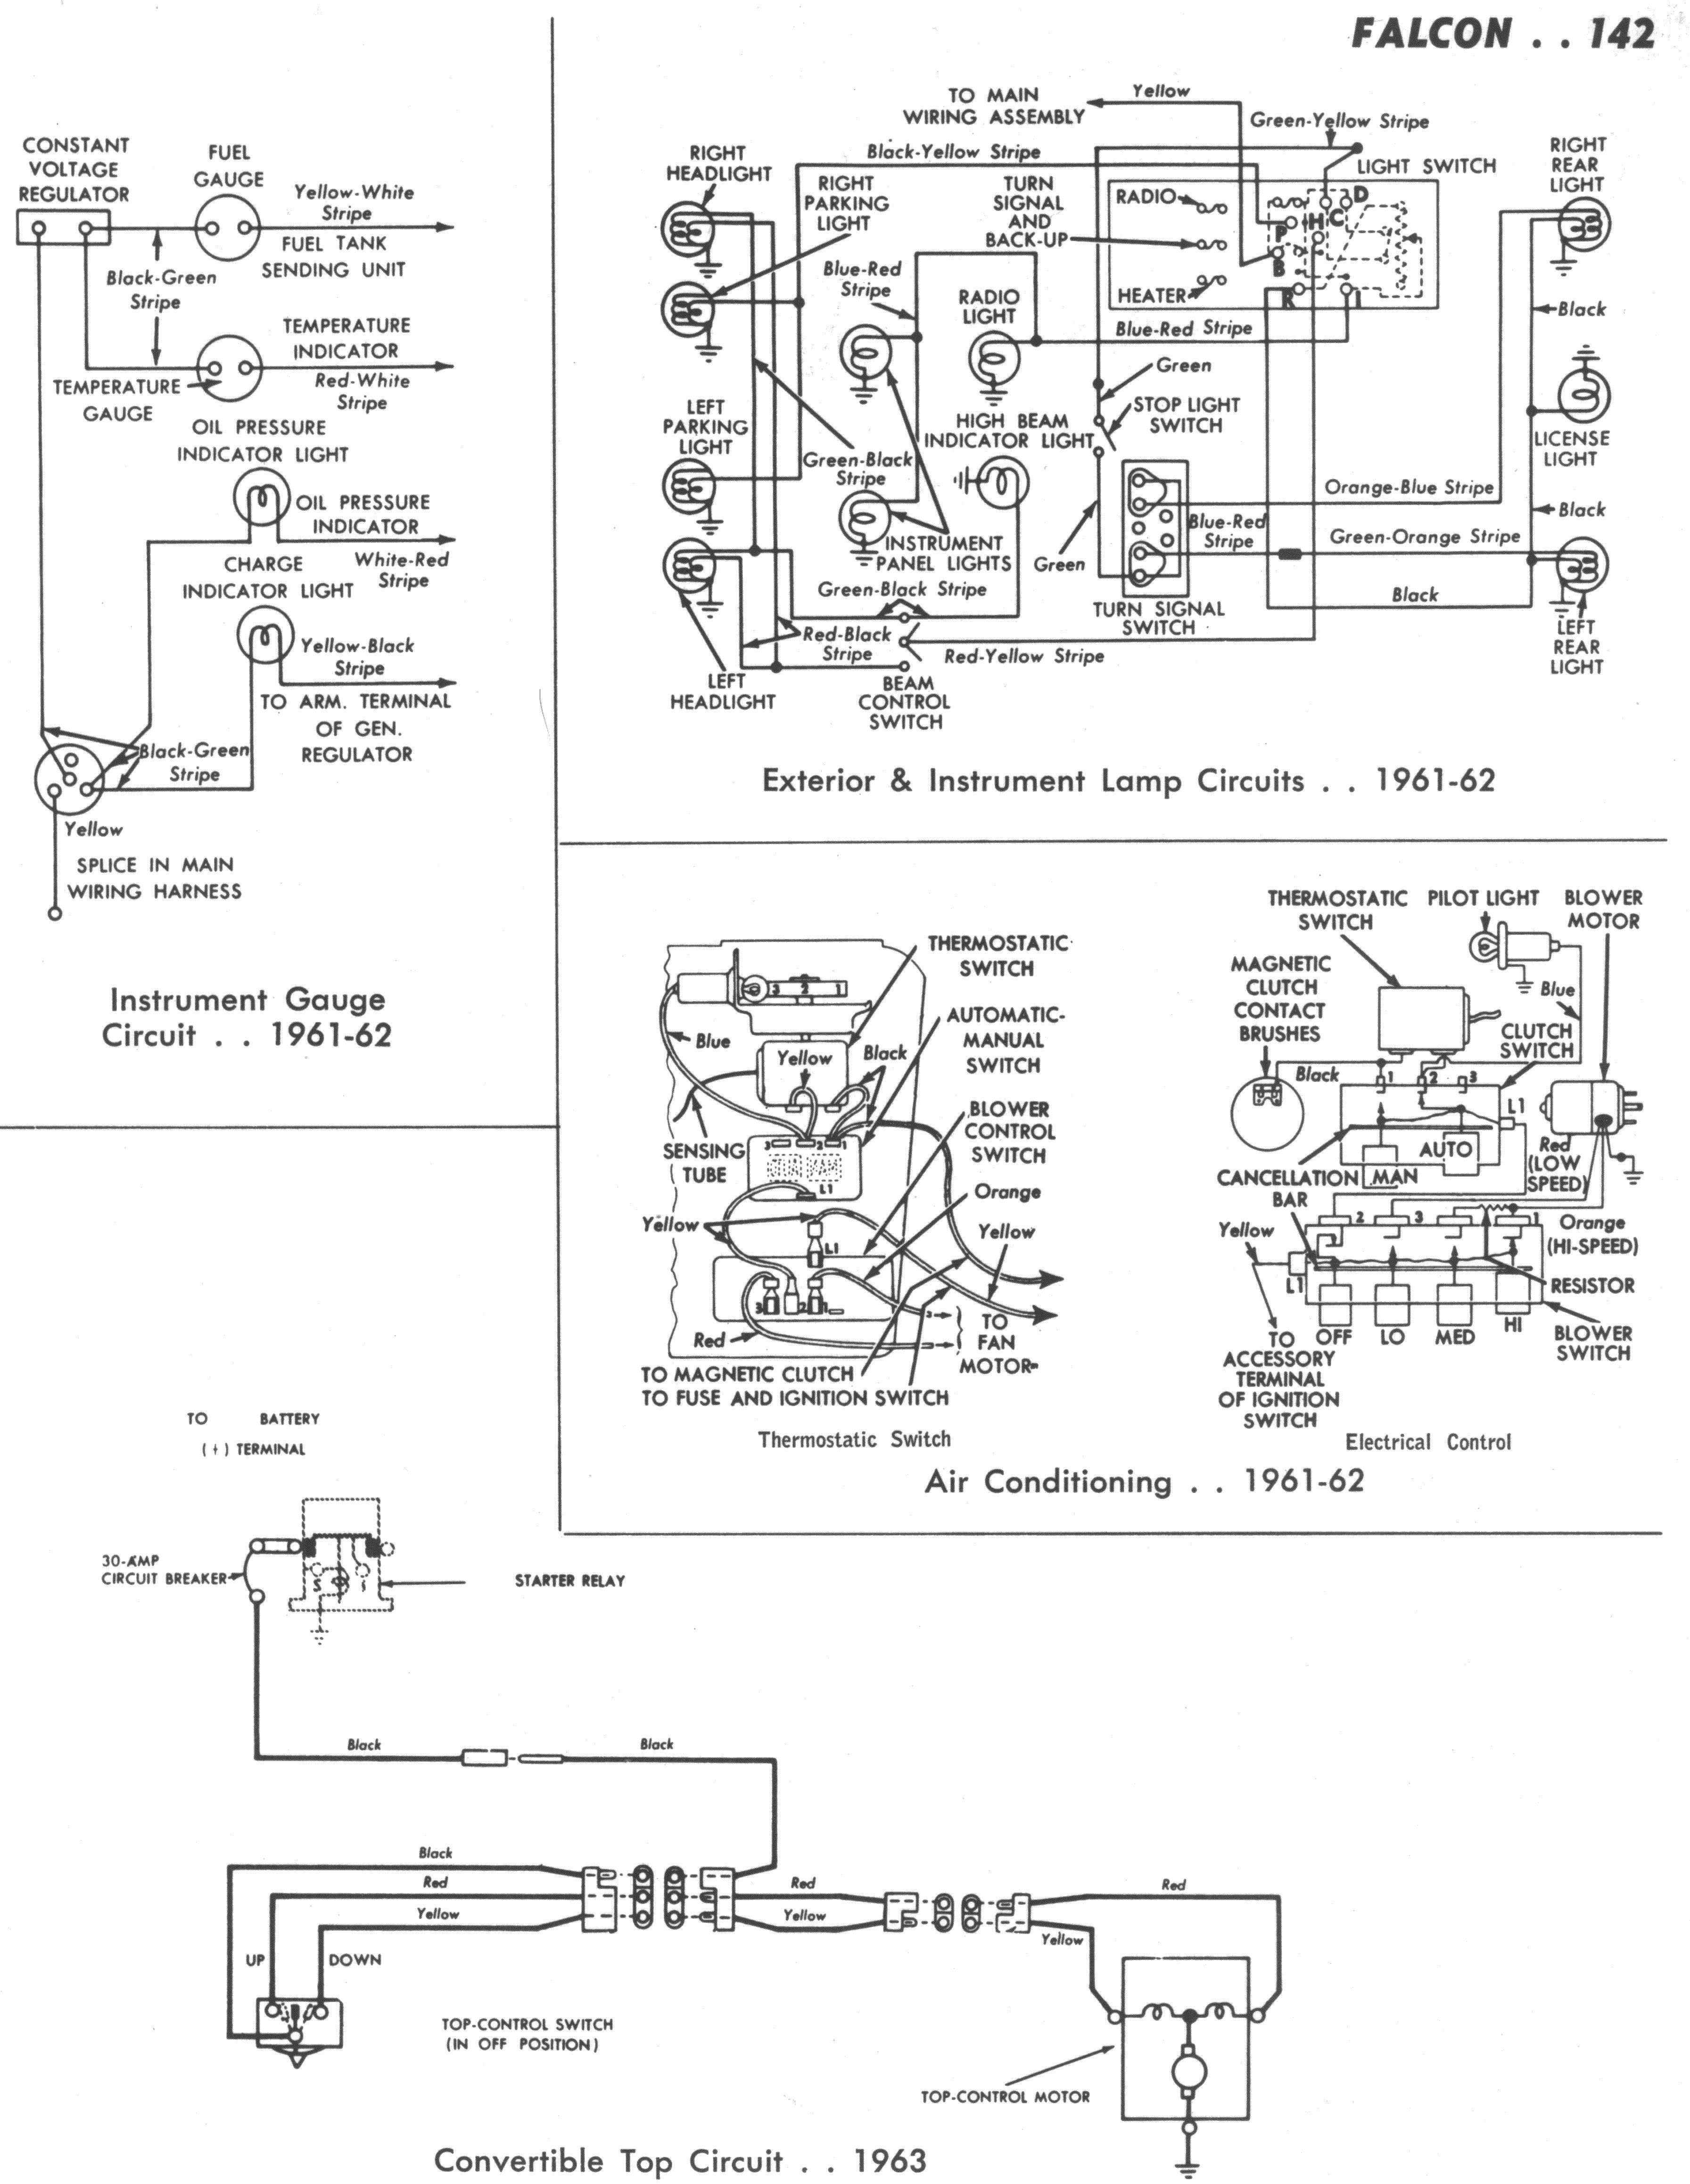 new wiring diagram ford falcon au radio diagram diagramtemplatenew wiring diagram ford falcon au radio diagram [ 3585 x 4634 Pixel ]